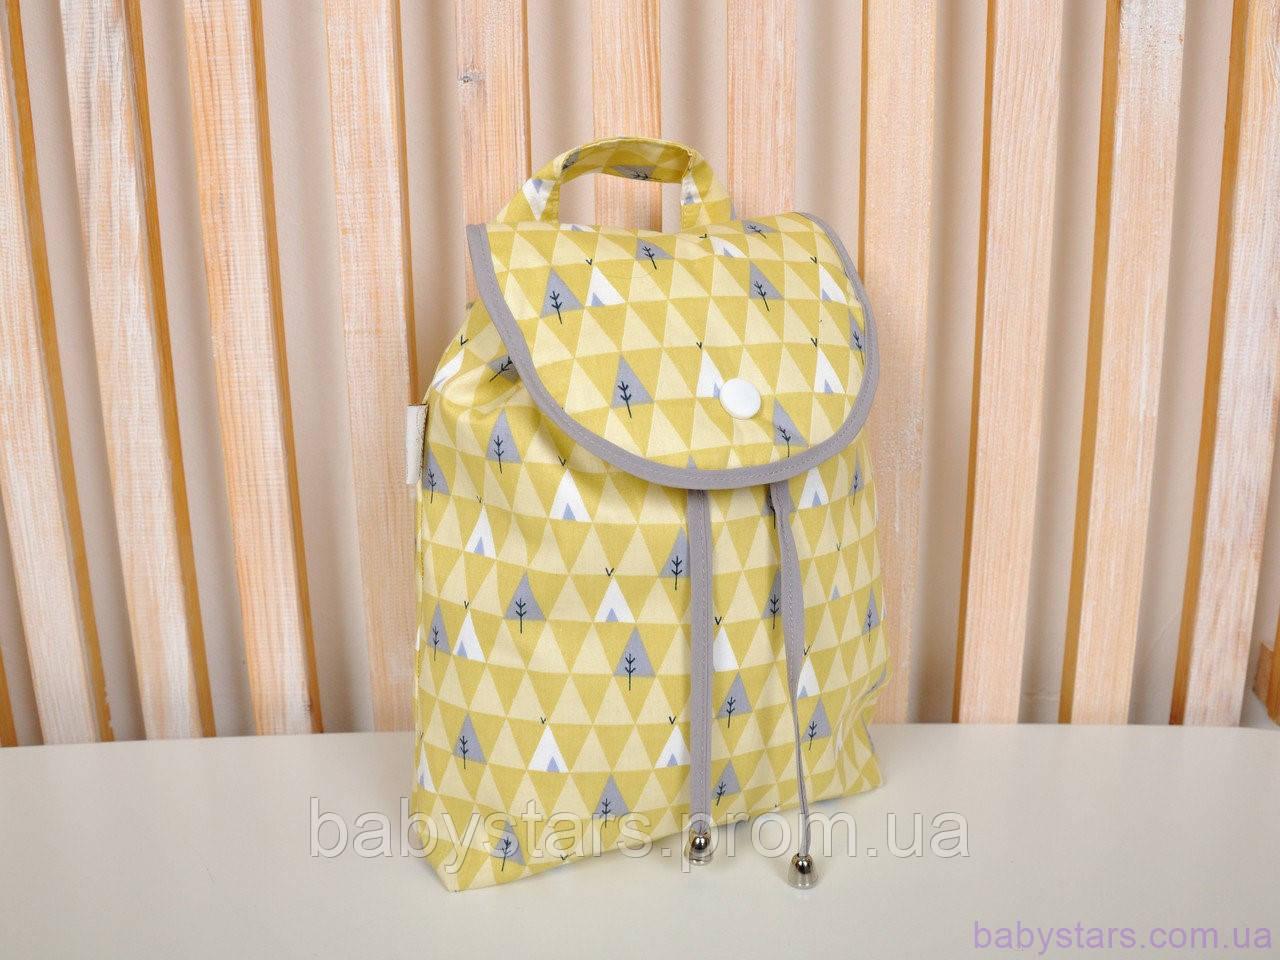 "Детские рюкзаки ""Елочки желтые"""